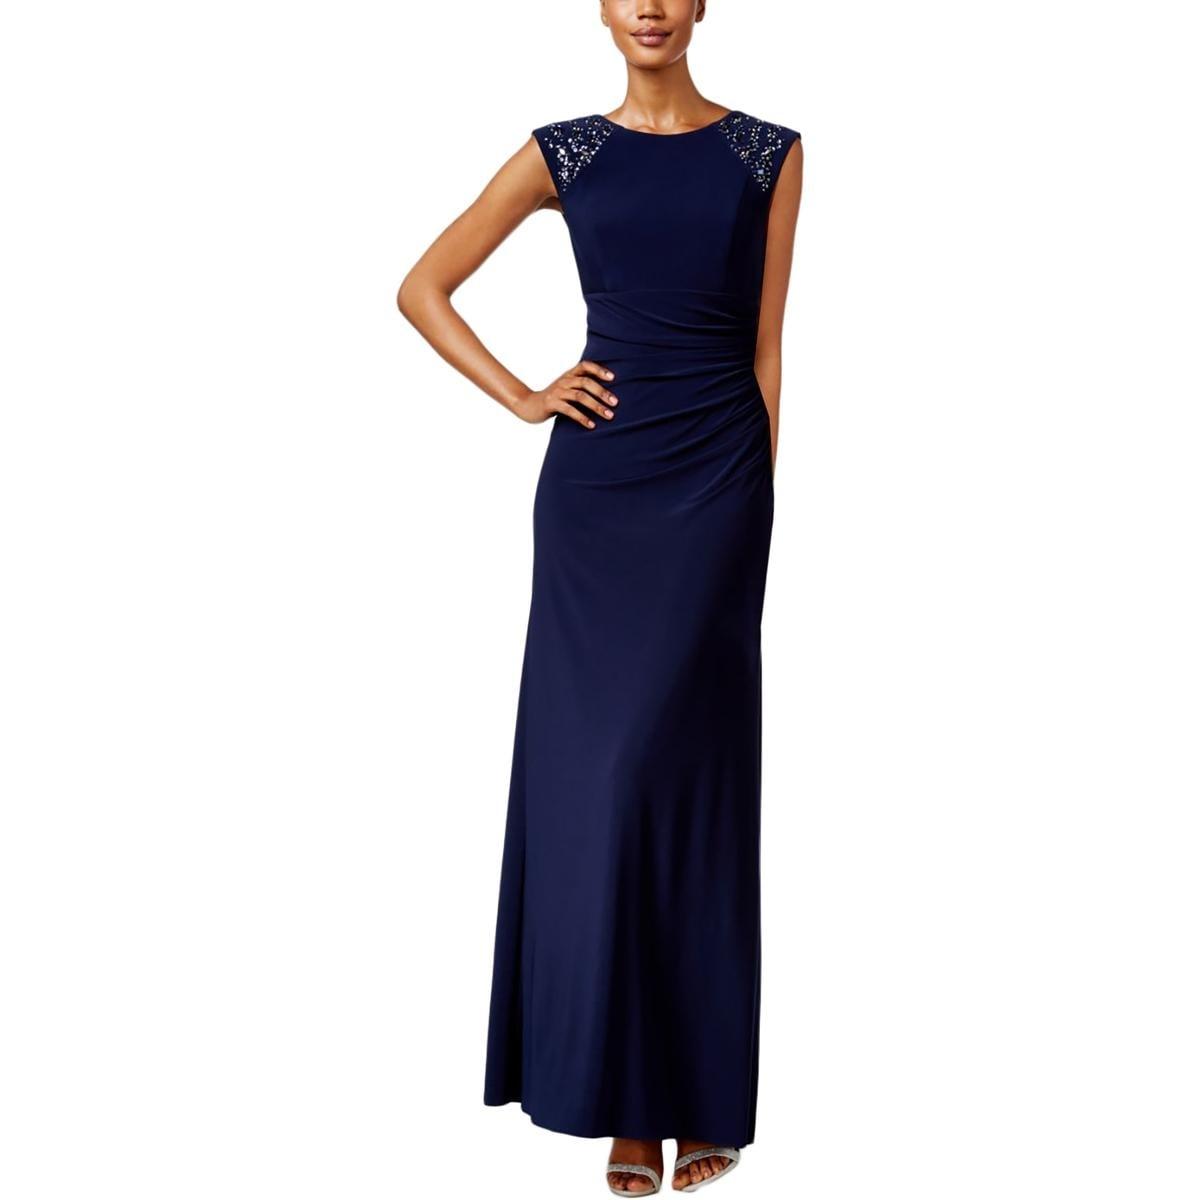 Shop Xscape Womens Evening Dress Embellished Full-Length - Free ...